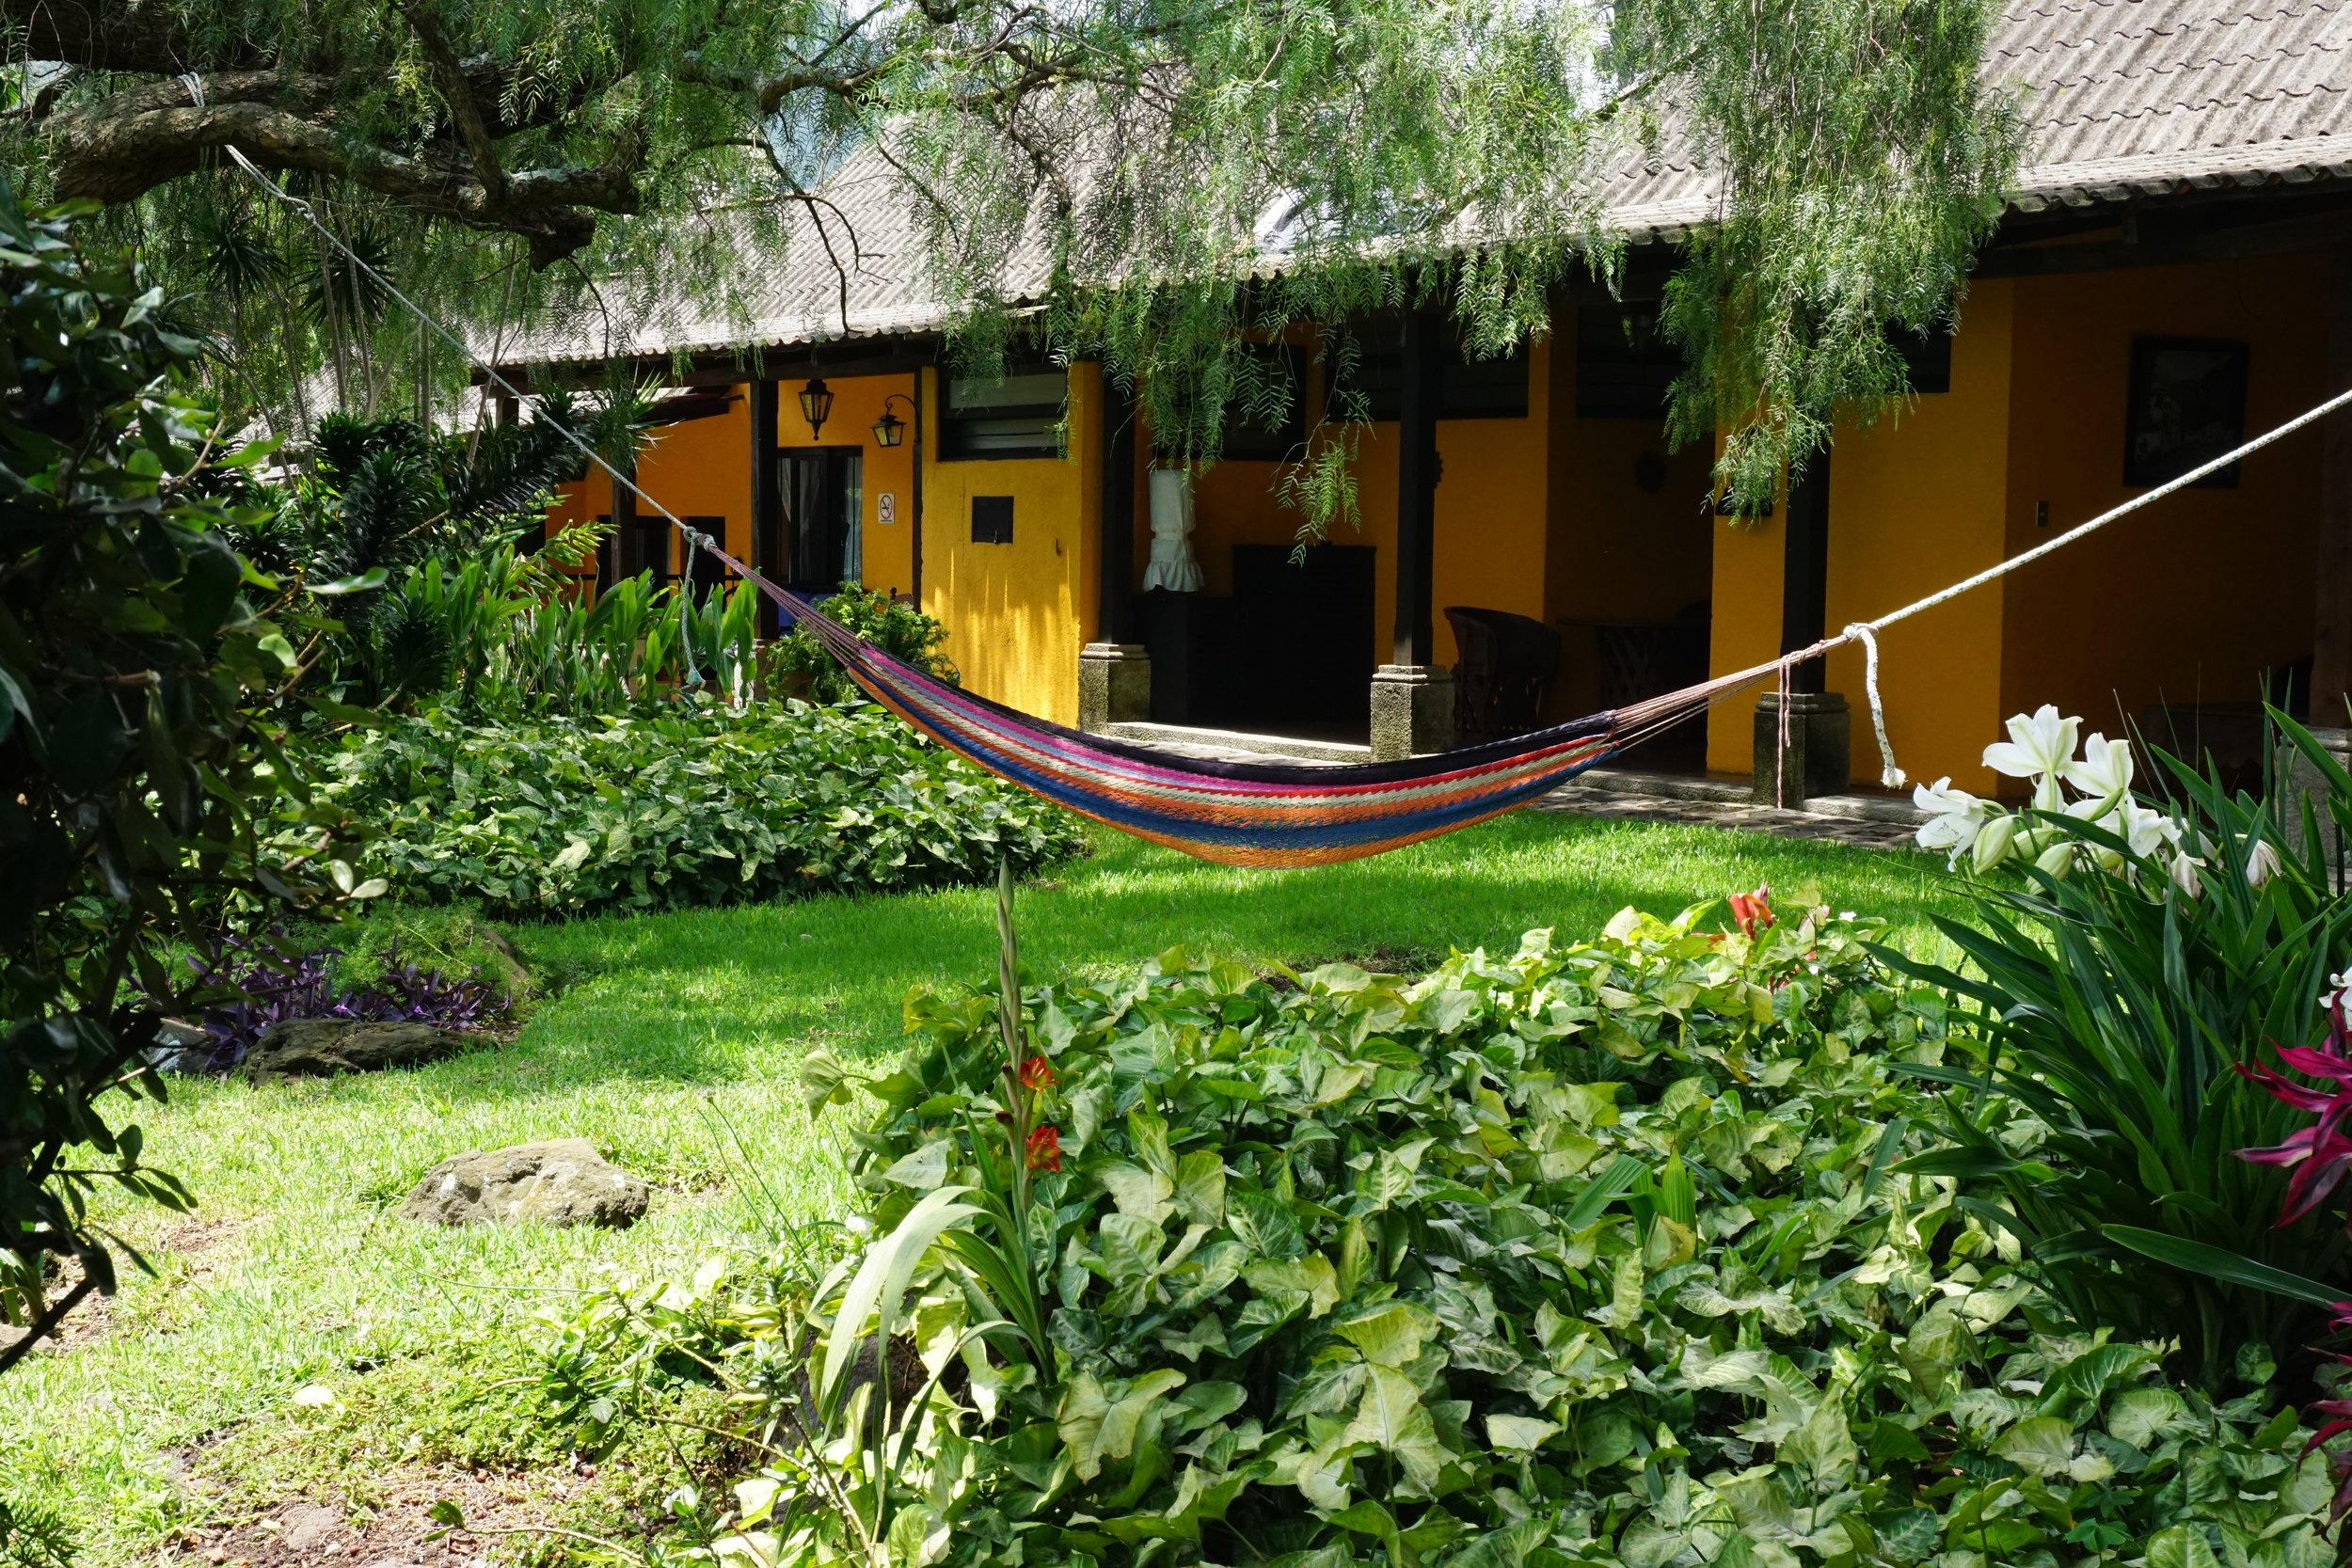 Hotel Toliman - Lakeside Hotel | Lake Atitlan, Guatemala